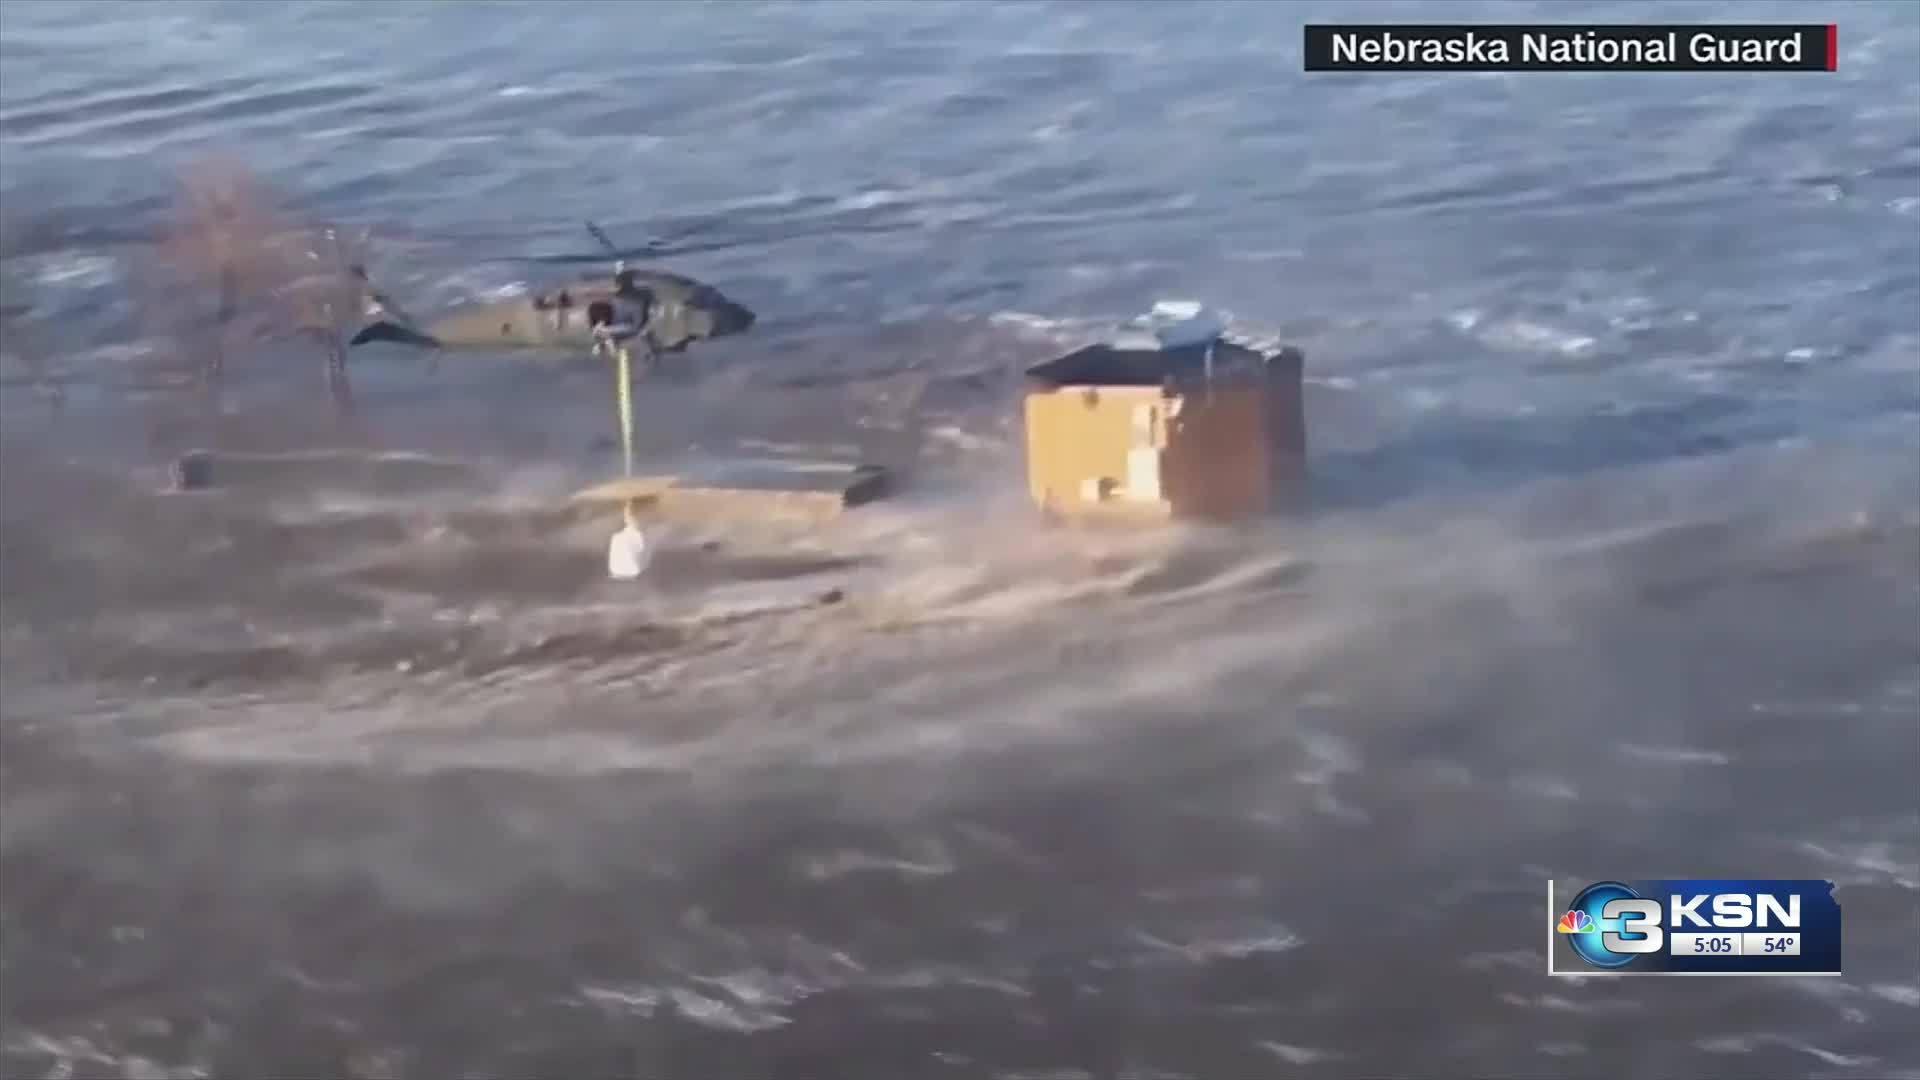 Kansans_are_helping_Nebraska_flood_victi_7_20190319221844-846624078